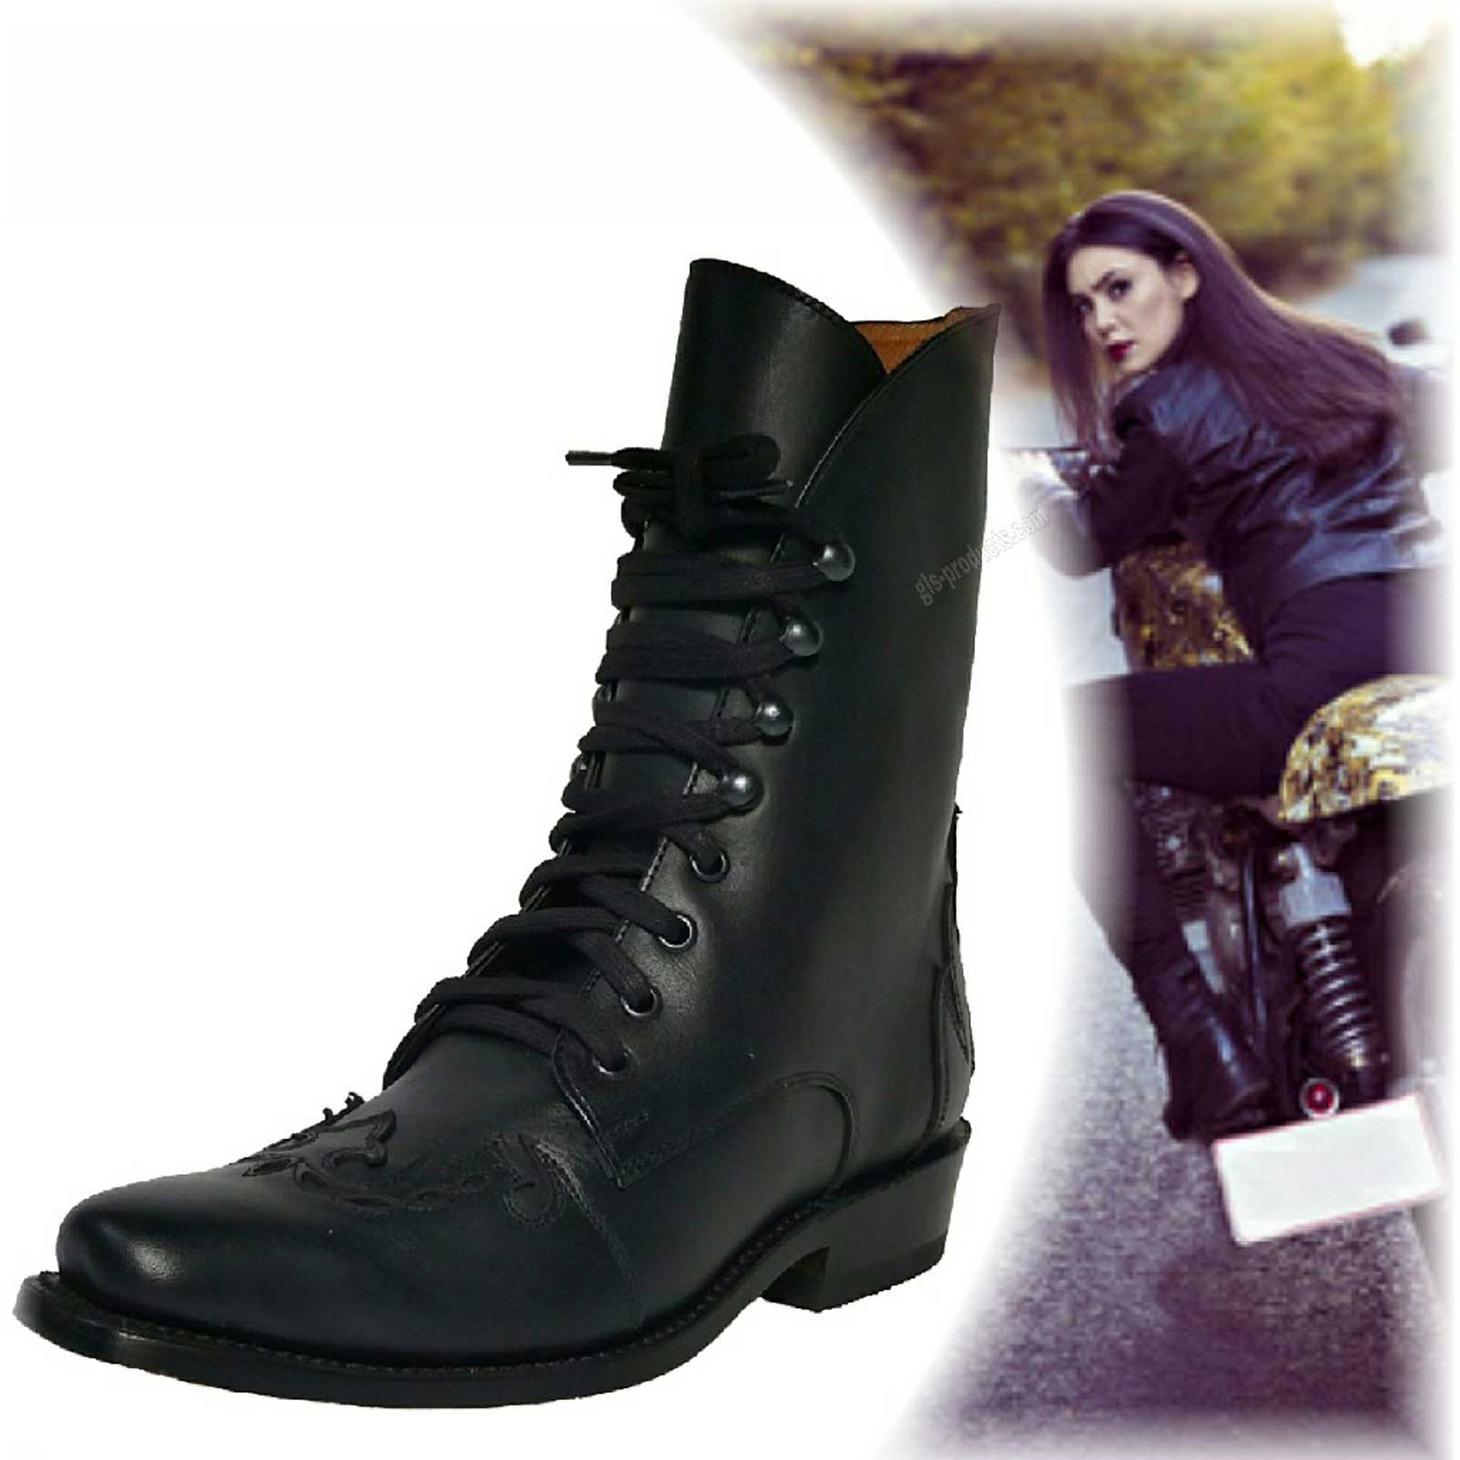 Mezcalero Primavera women's ankle boots